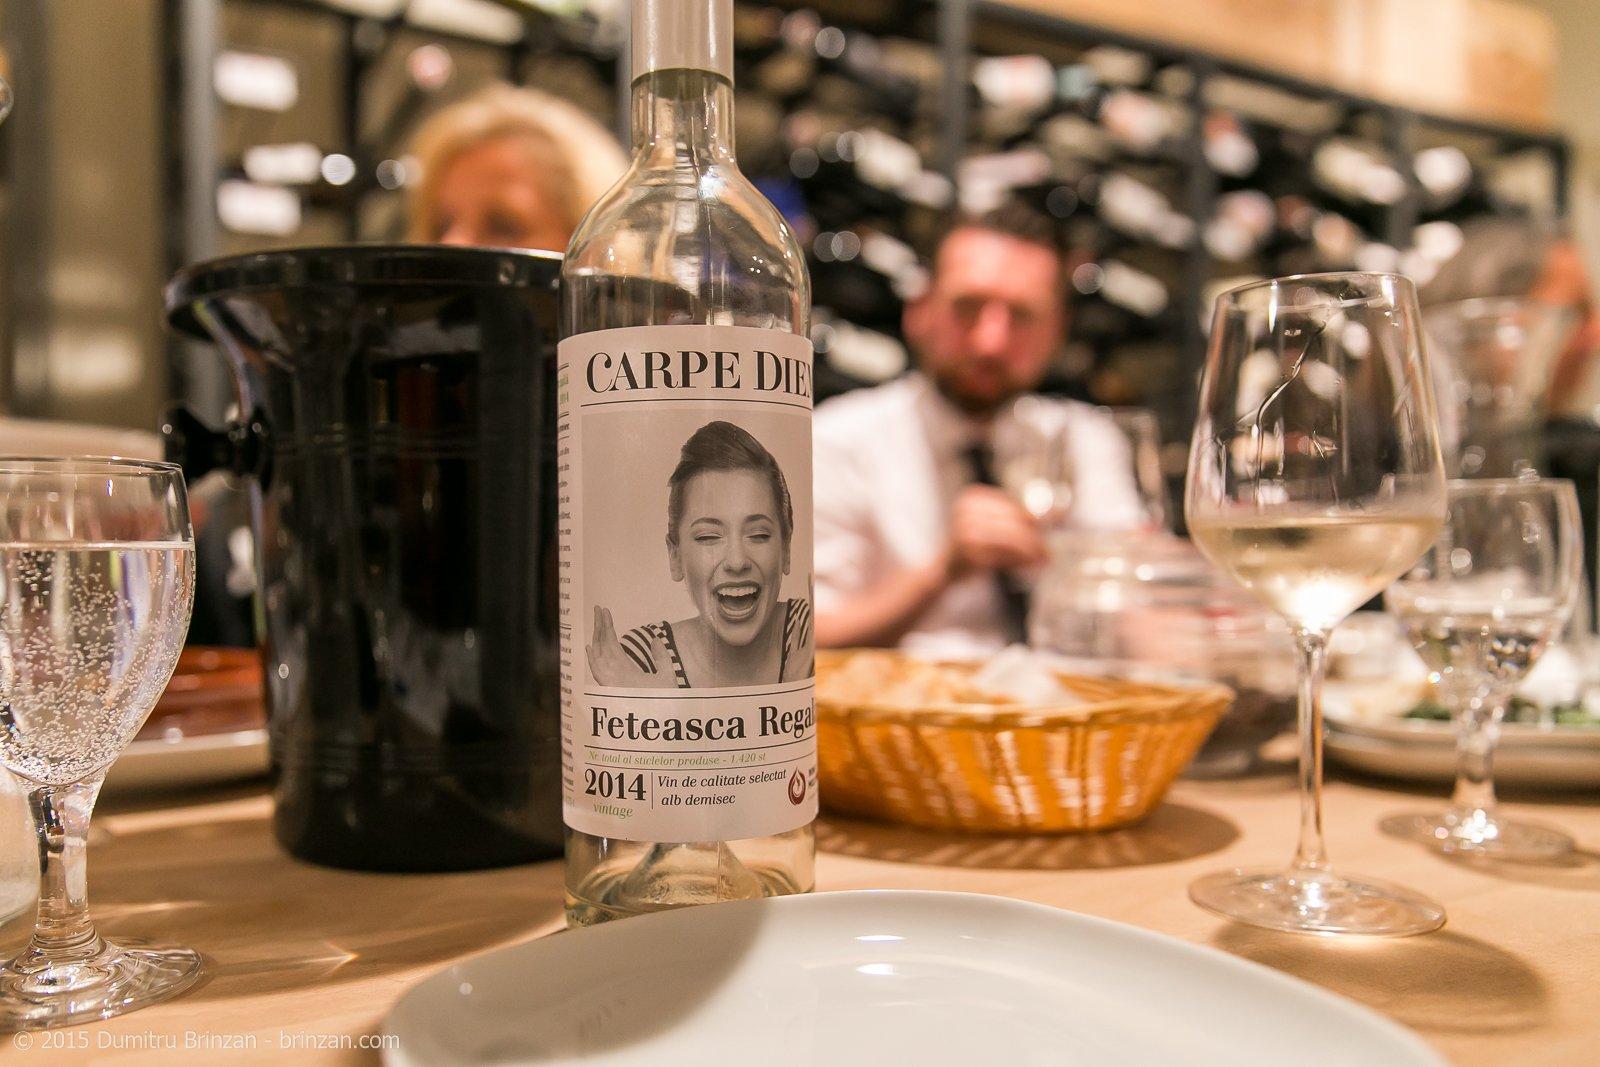 A bottle of Carpe Diem Feteasca Regala 2014 on a Table